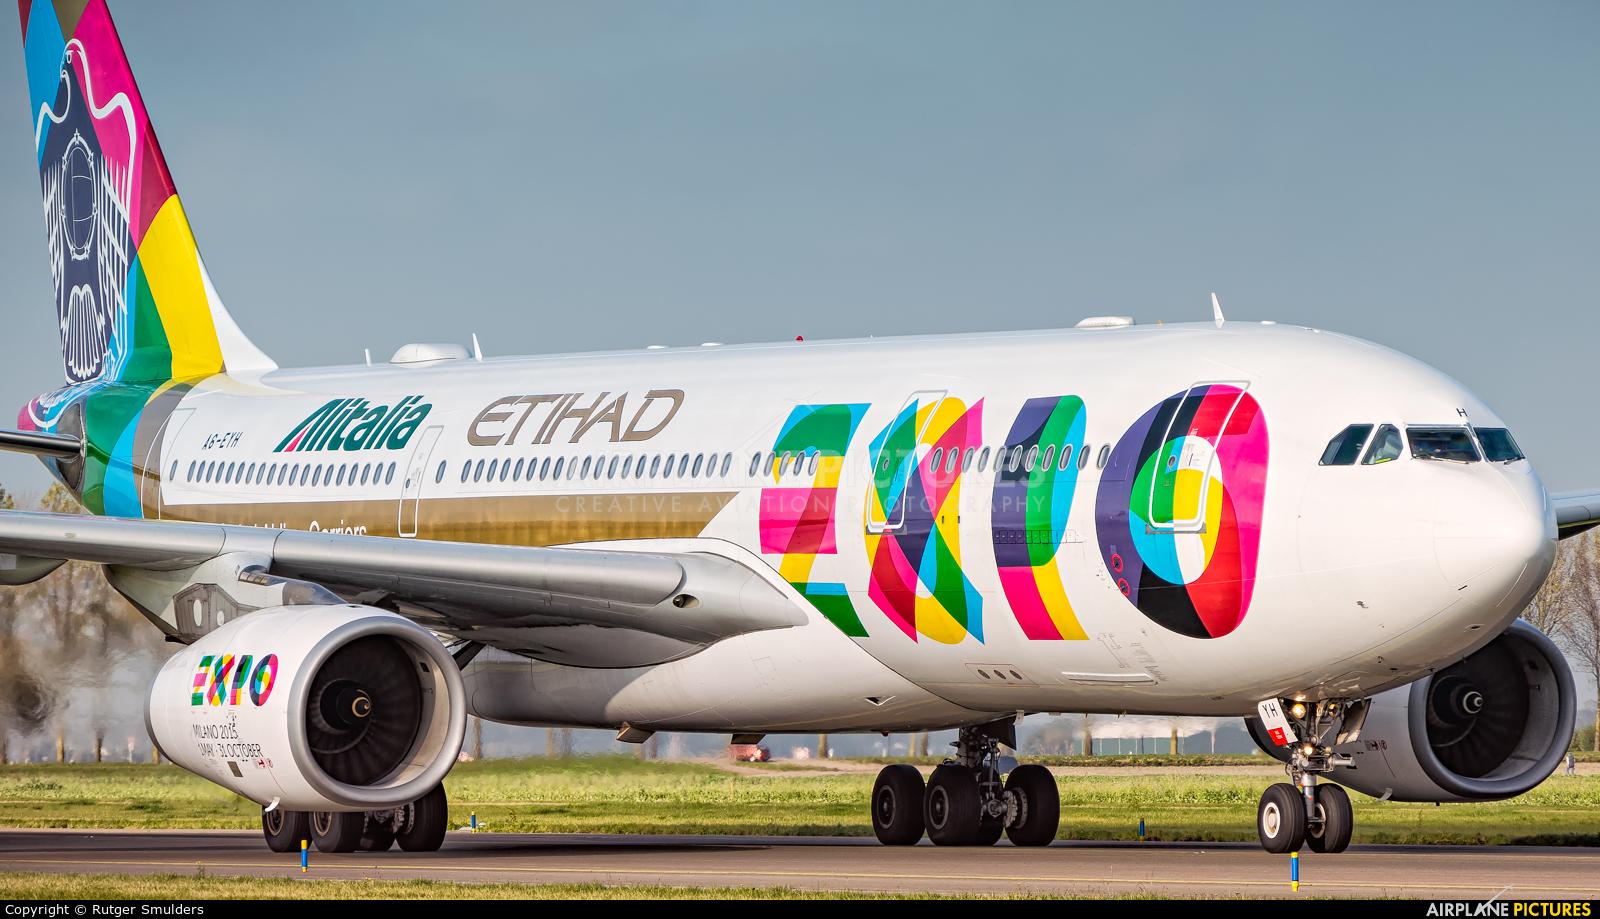 Etihad Airways A6-EYH aircraft at Amsterdam - Schiphol